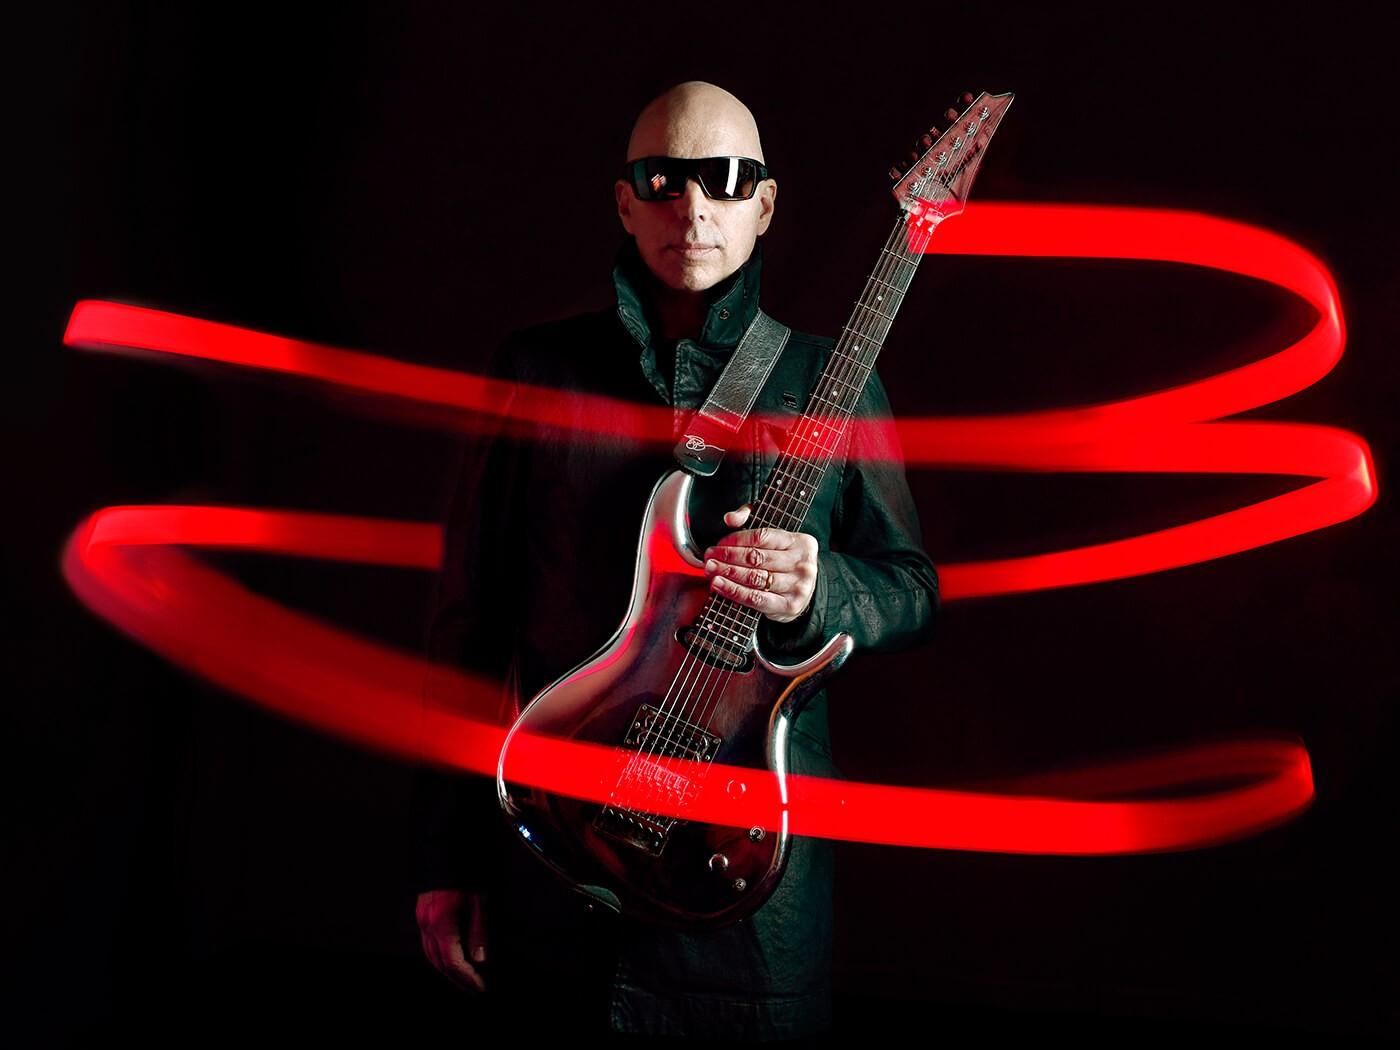 Факты, слухи, домыслы о Joe Satriani